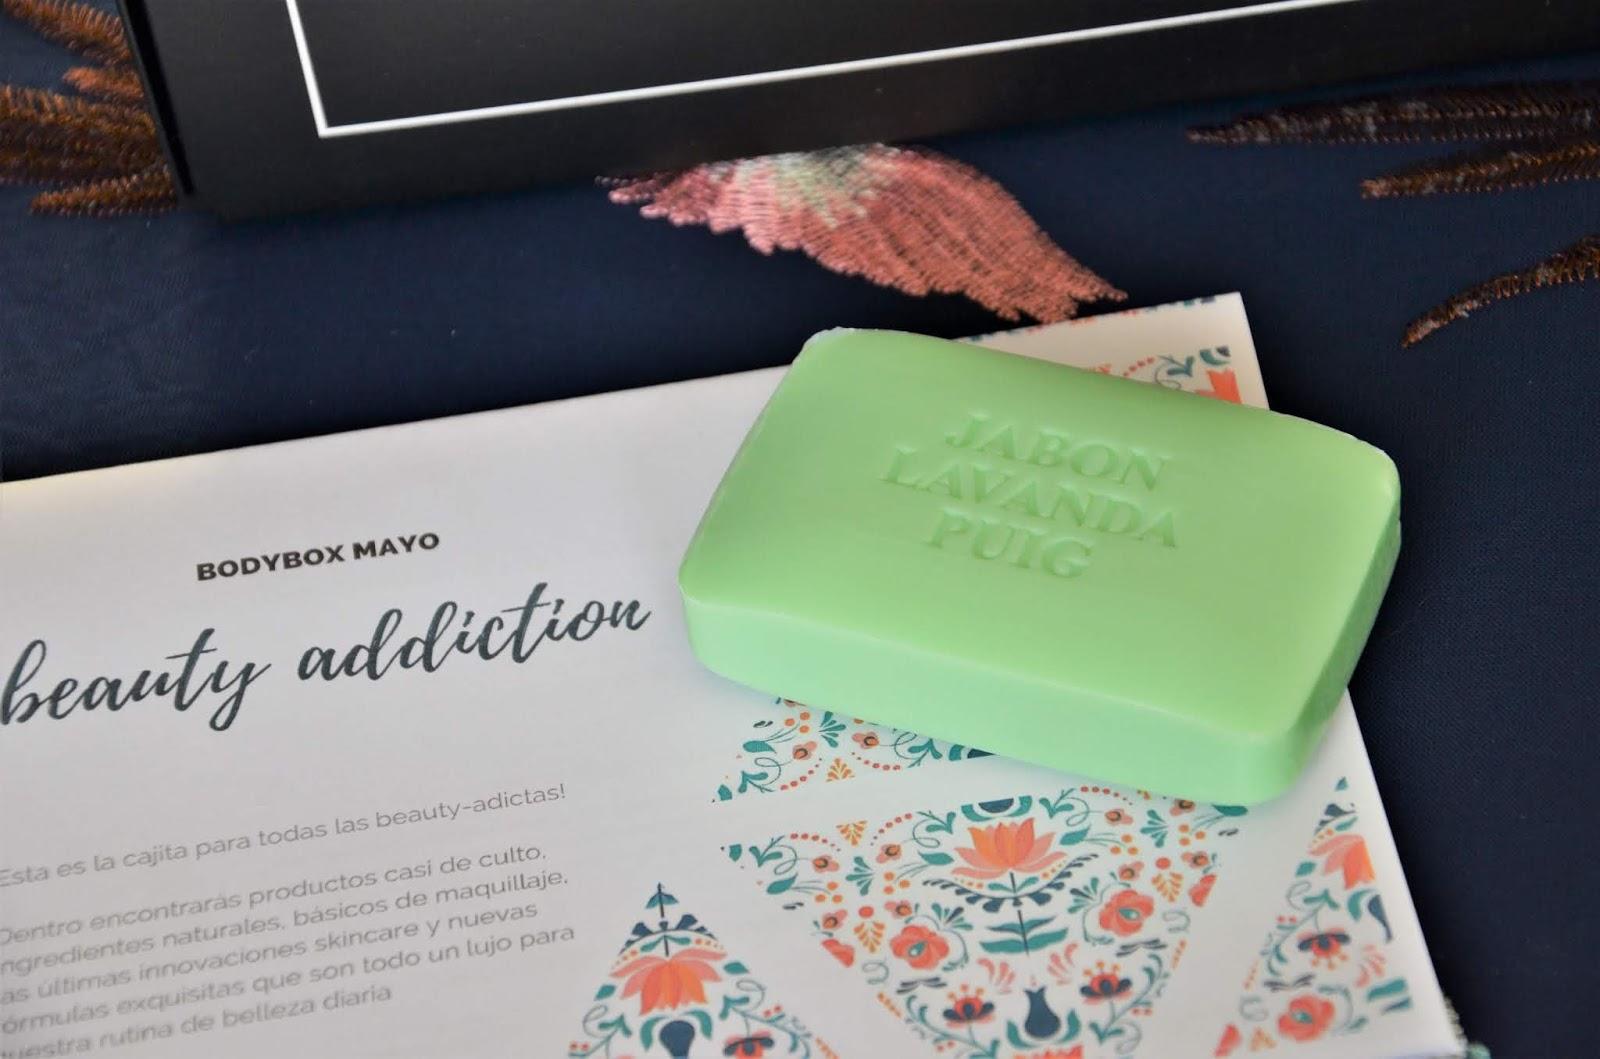 Moderno Uñas Felicidad Y Spa Motivo - Ideas Para Pintar Uñas - knxc.info